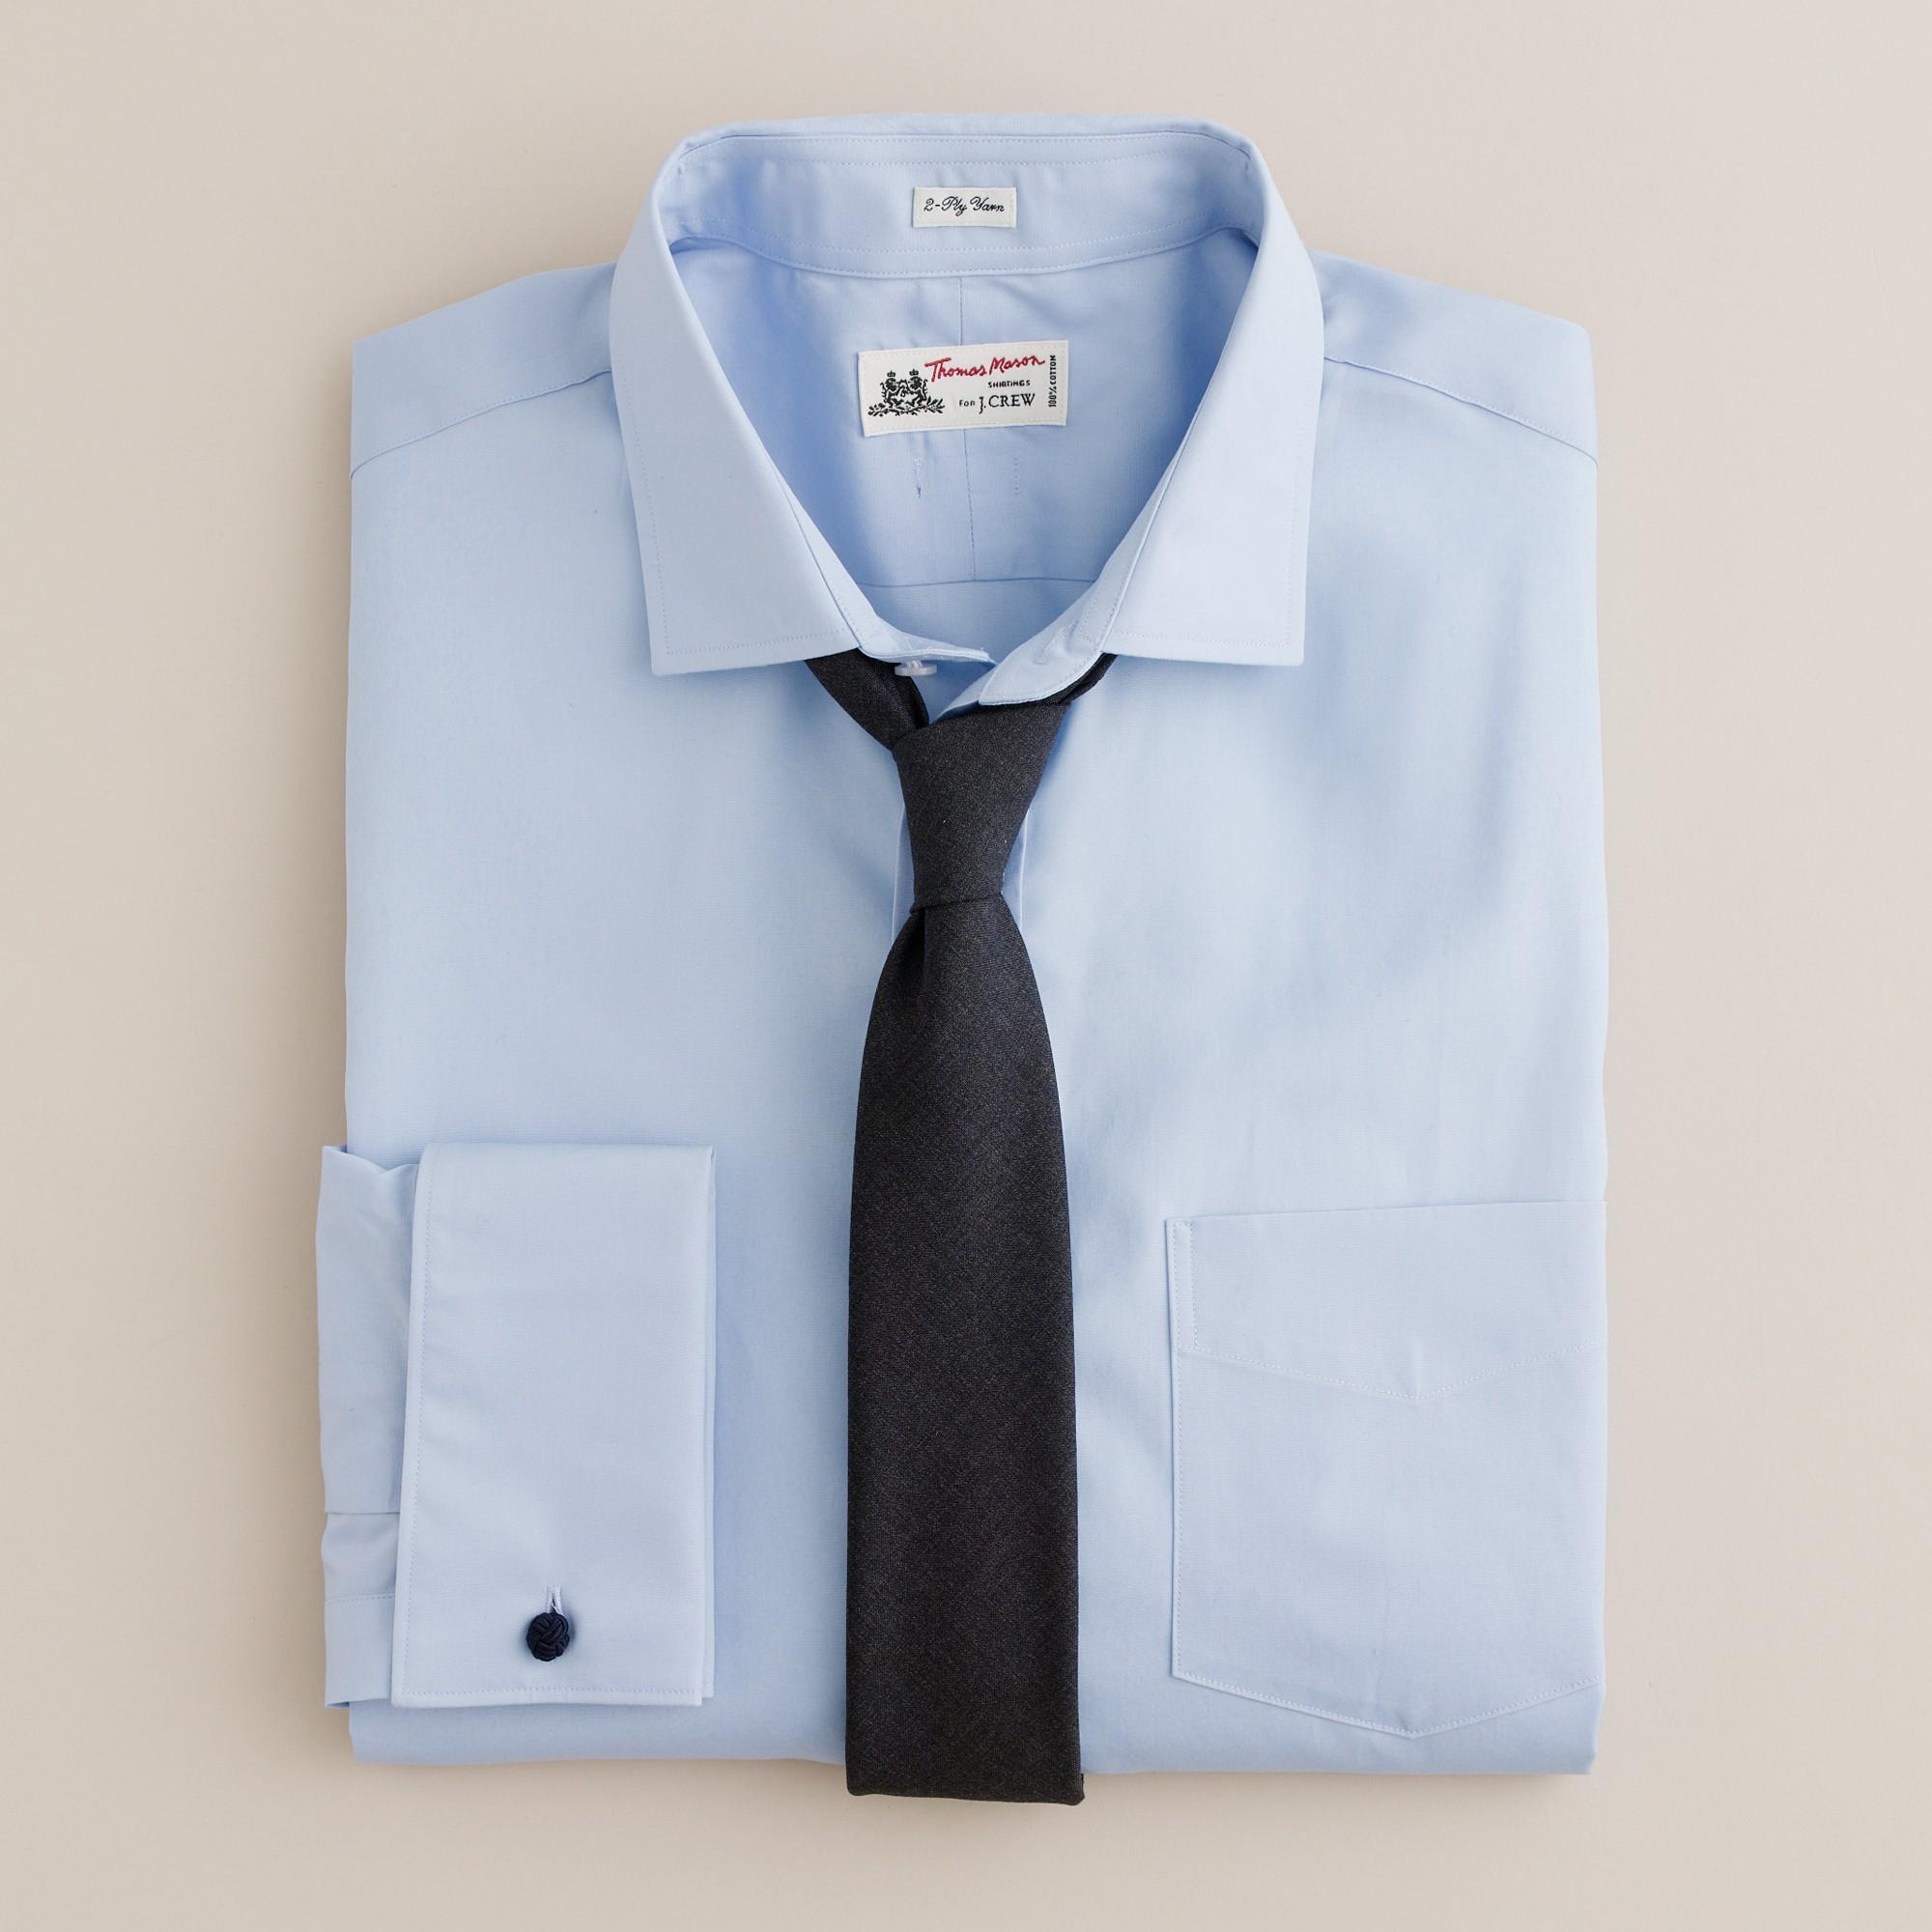 Thomas Mason Fabric French Cuff Dress Shirt In